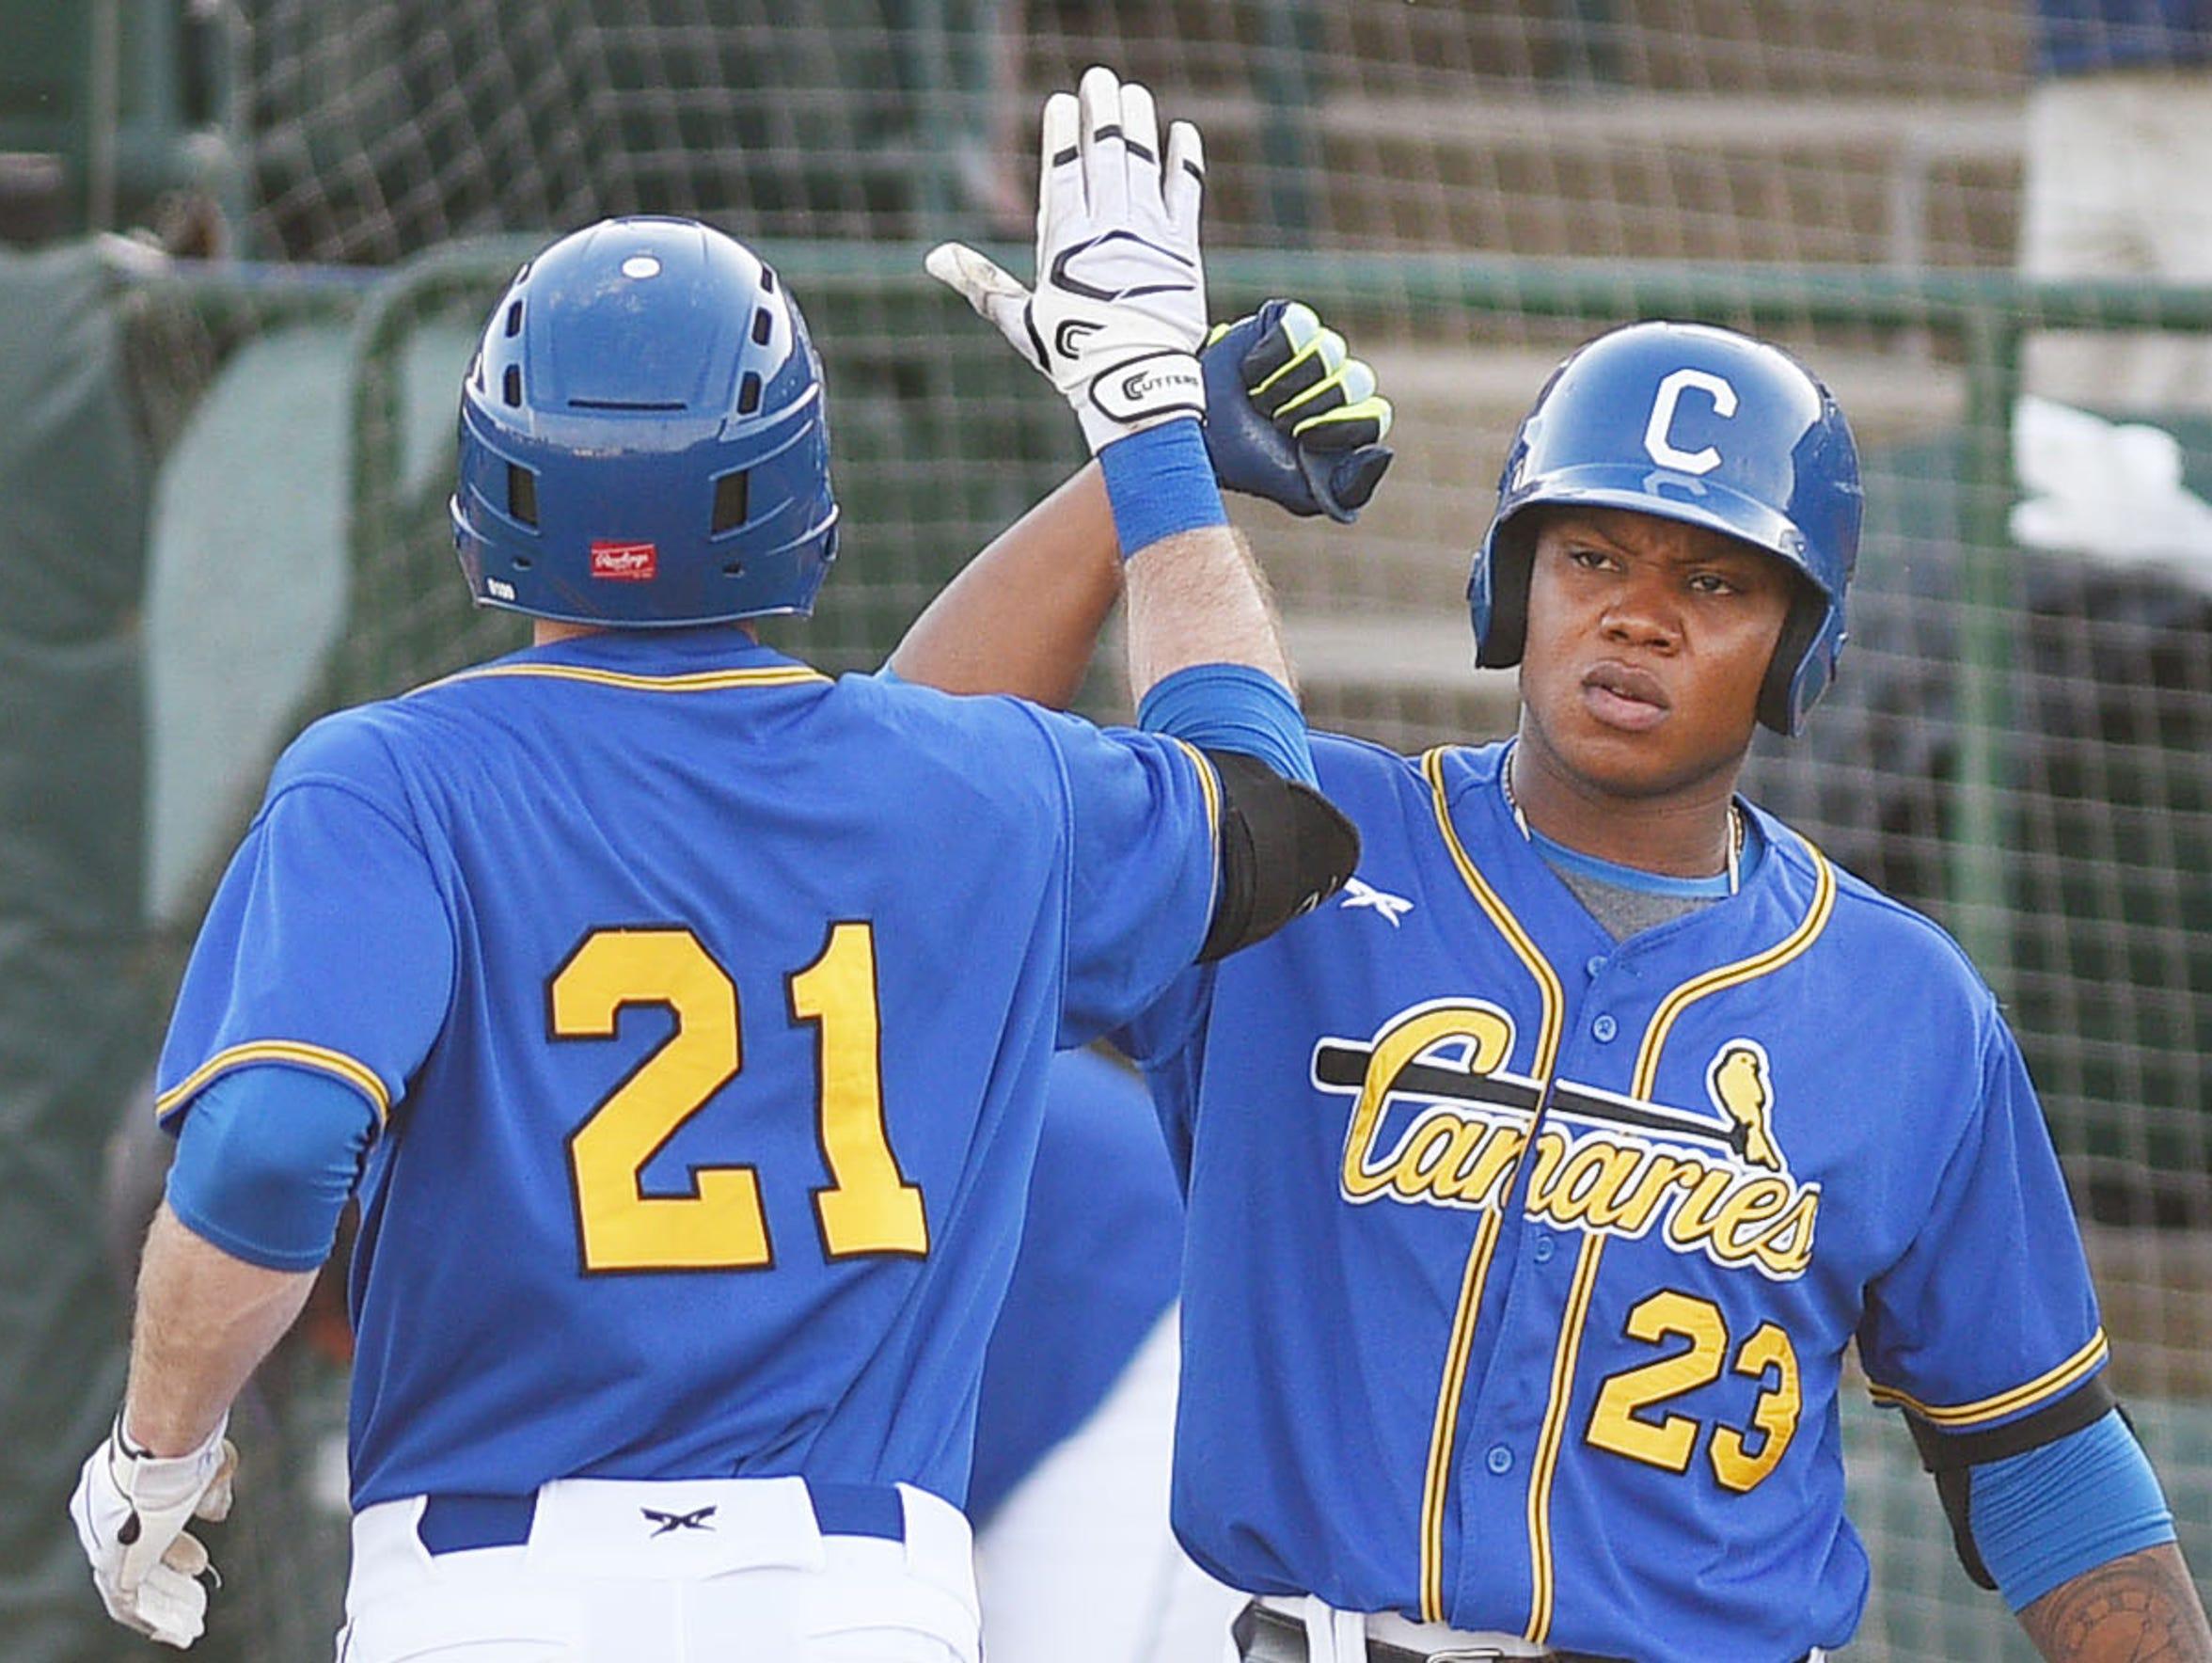 Canaries baseball at the Birdcage provides summer entertainment